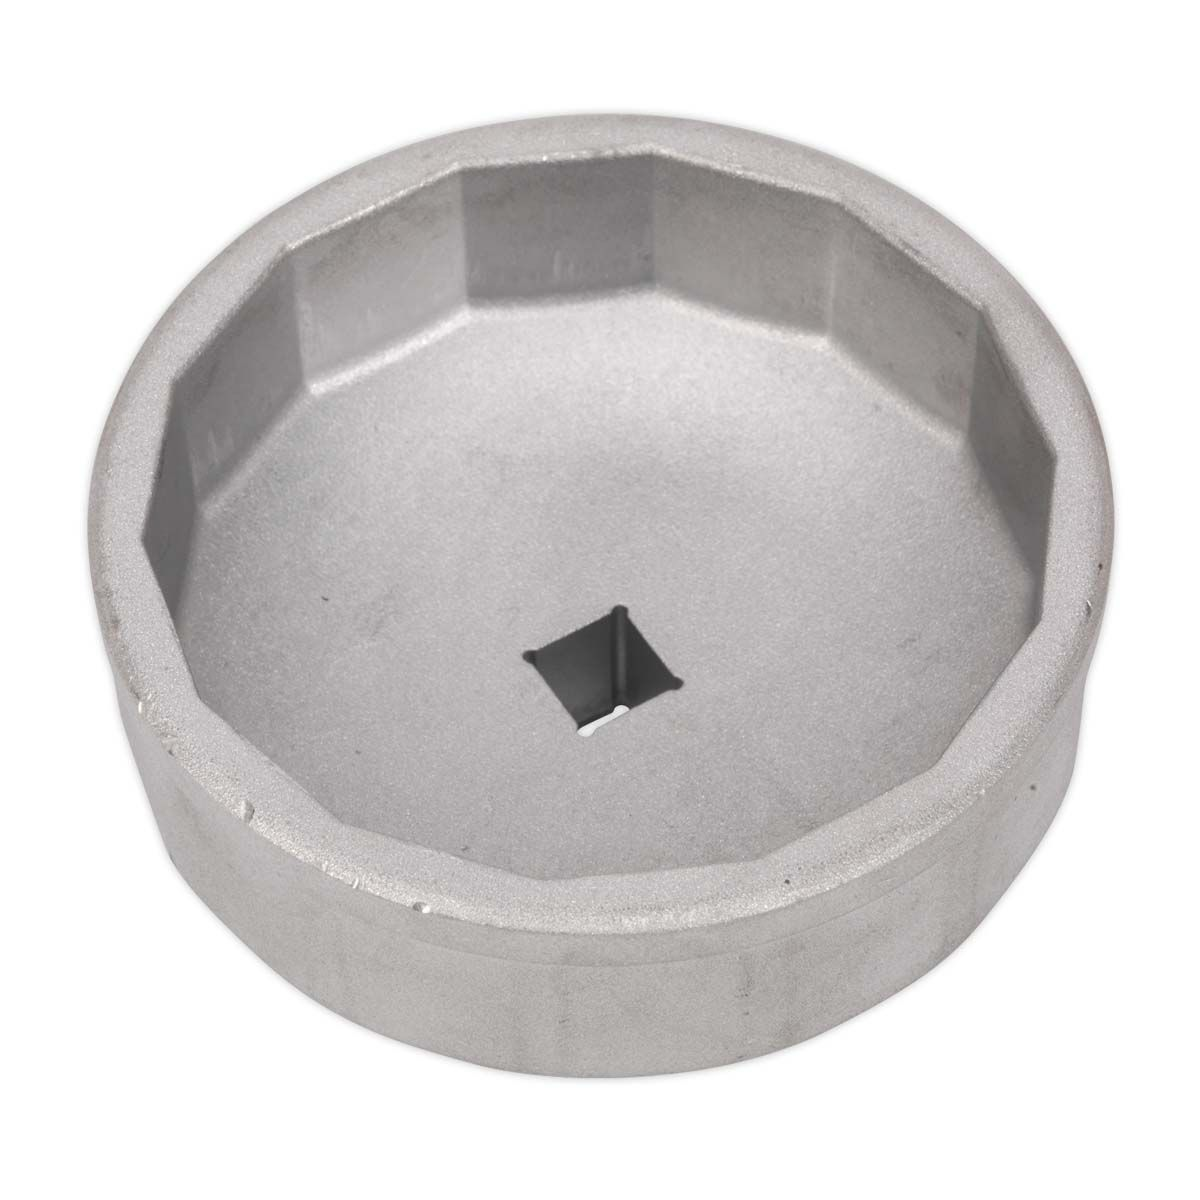 Sealey Oil Filter Cap Wrench Ø74.5mm x 14 Flutes - Mercedes